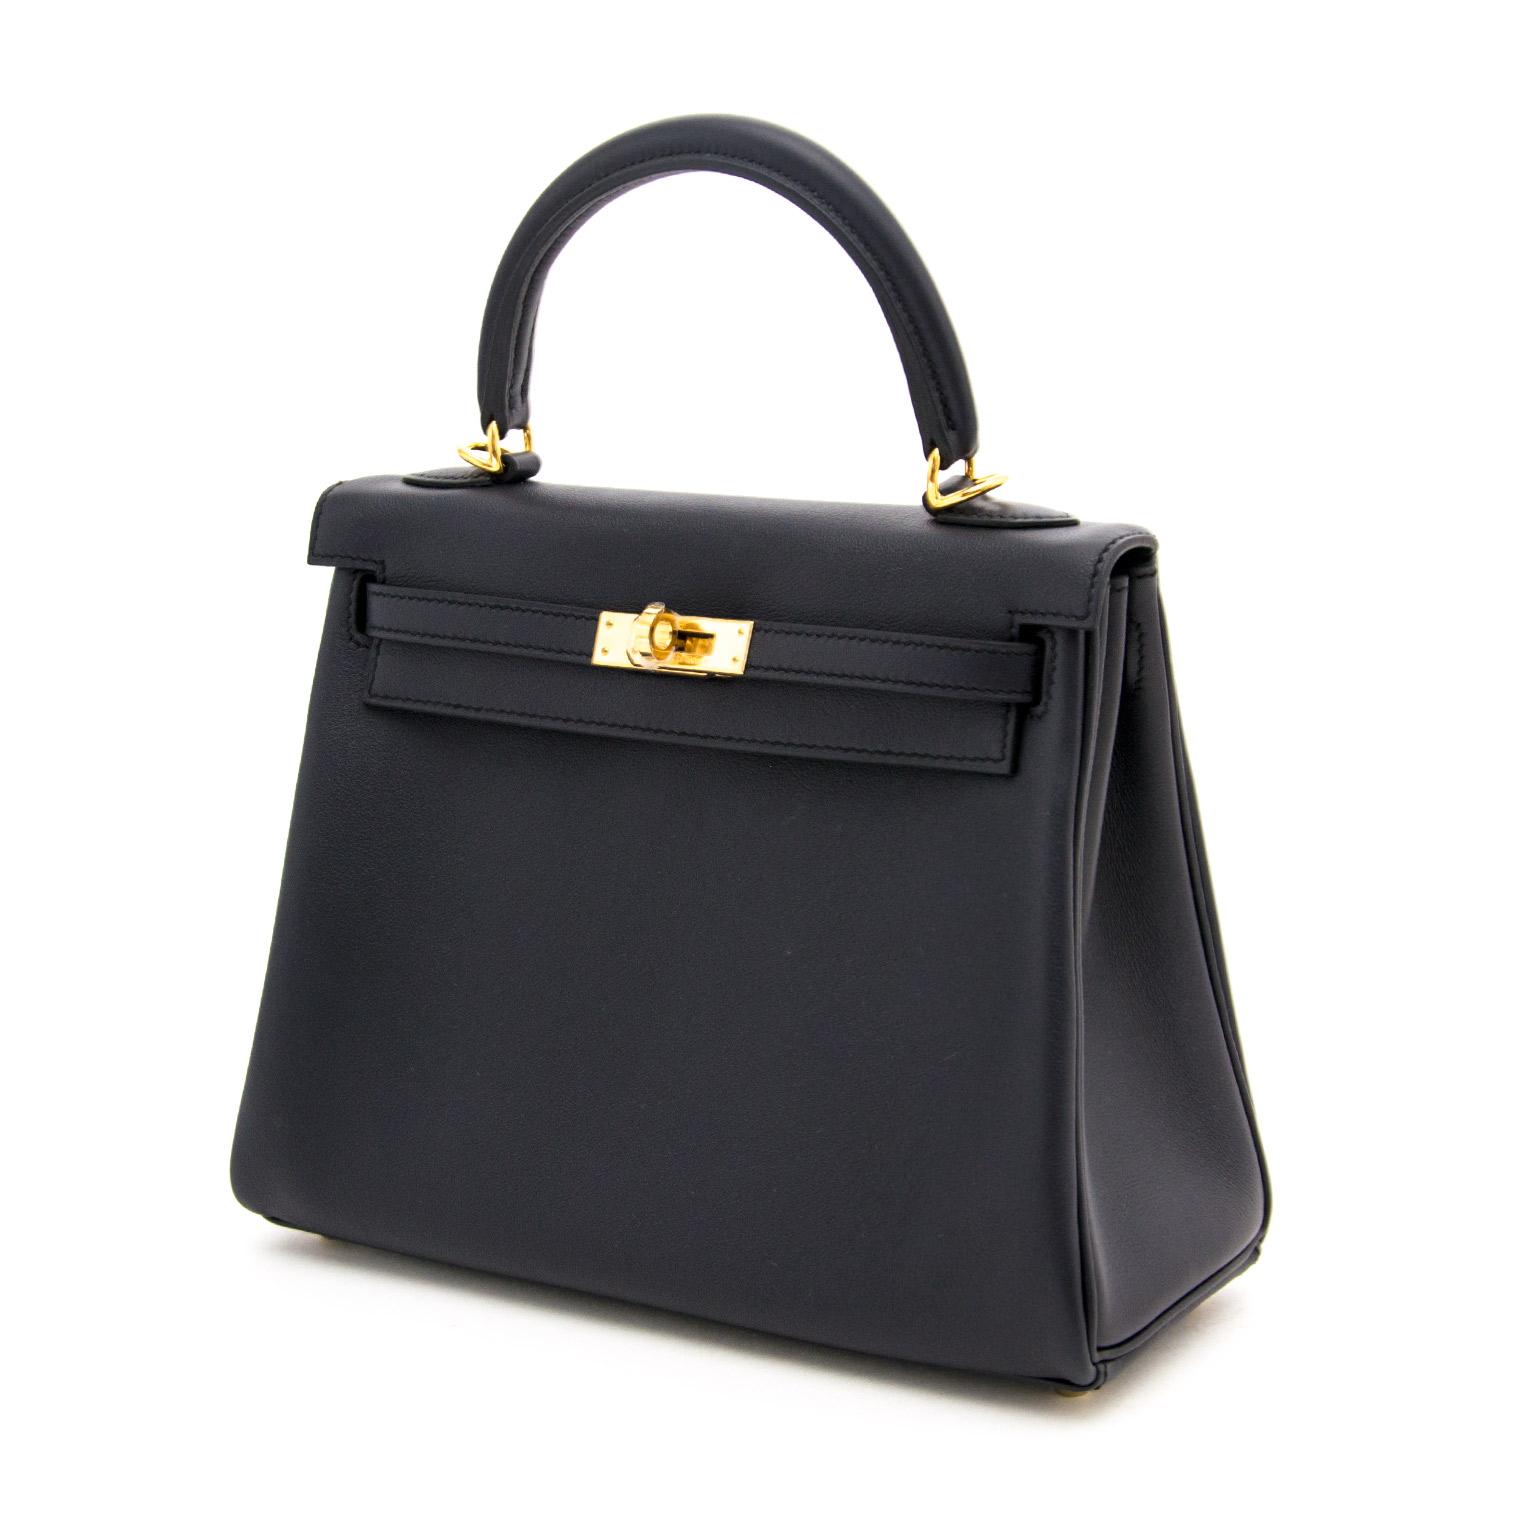 d9580e3b007 ... Buy authentic Hermès Kelly 25cm Swift Blue Indigo GHW at LabelLOV  vintage webshop. Luxe,